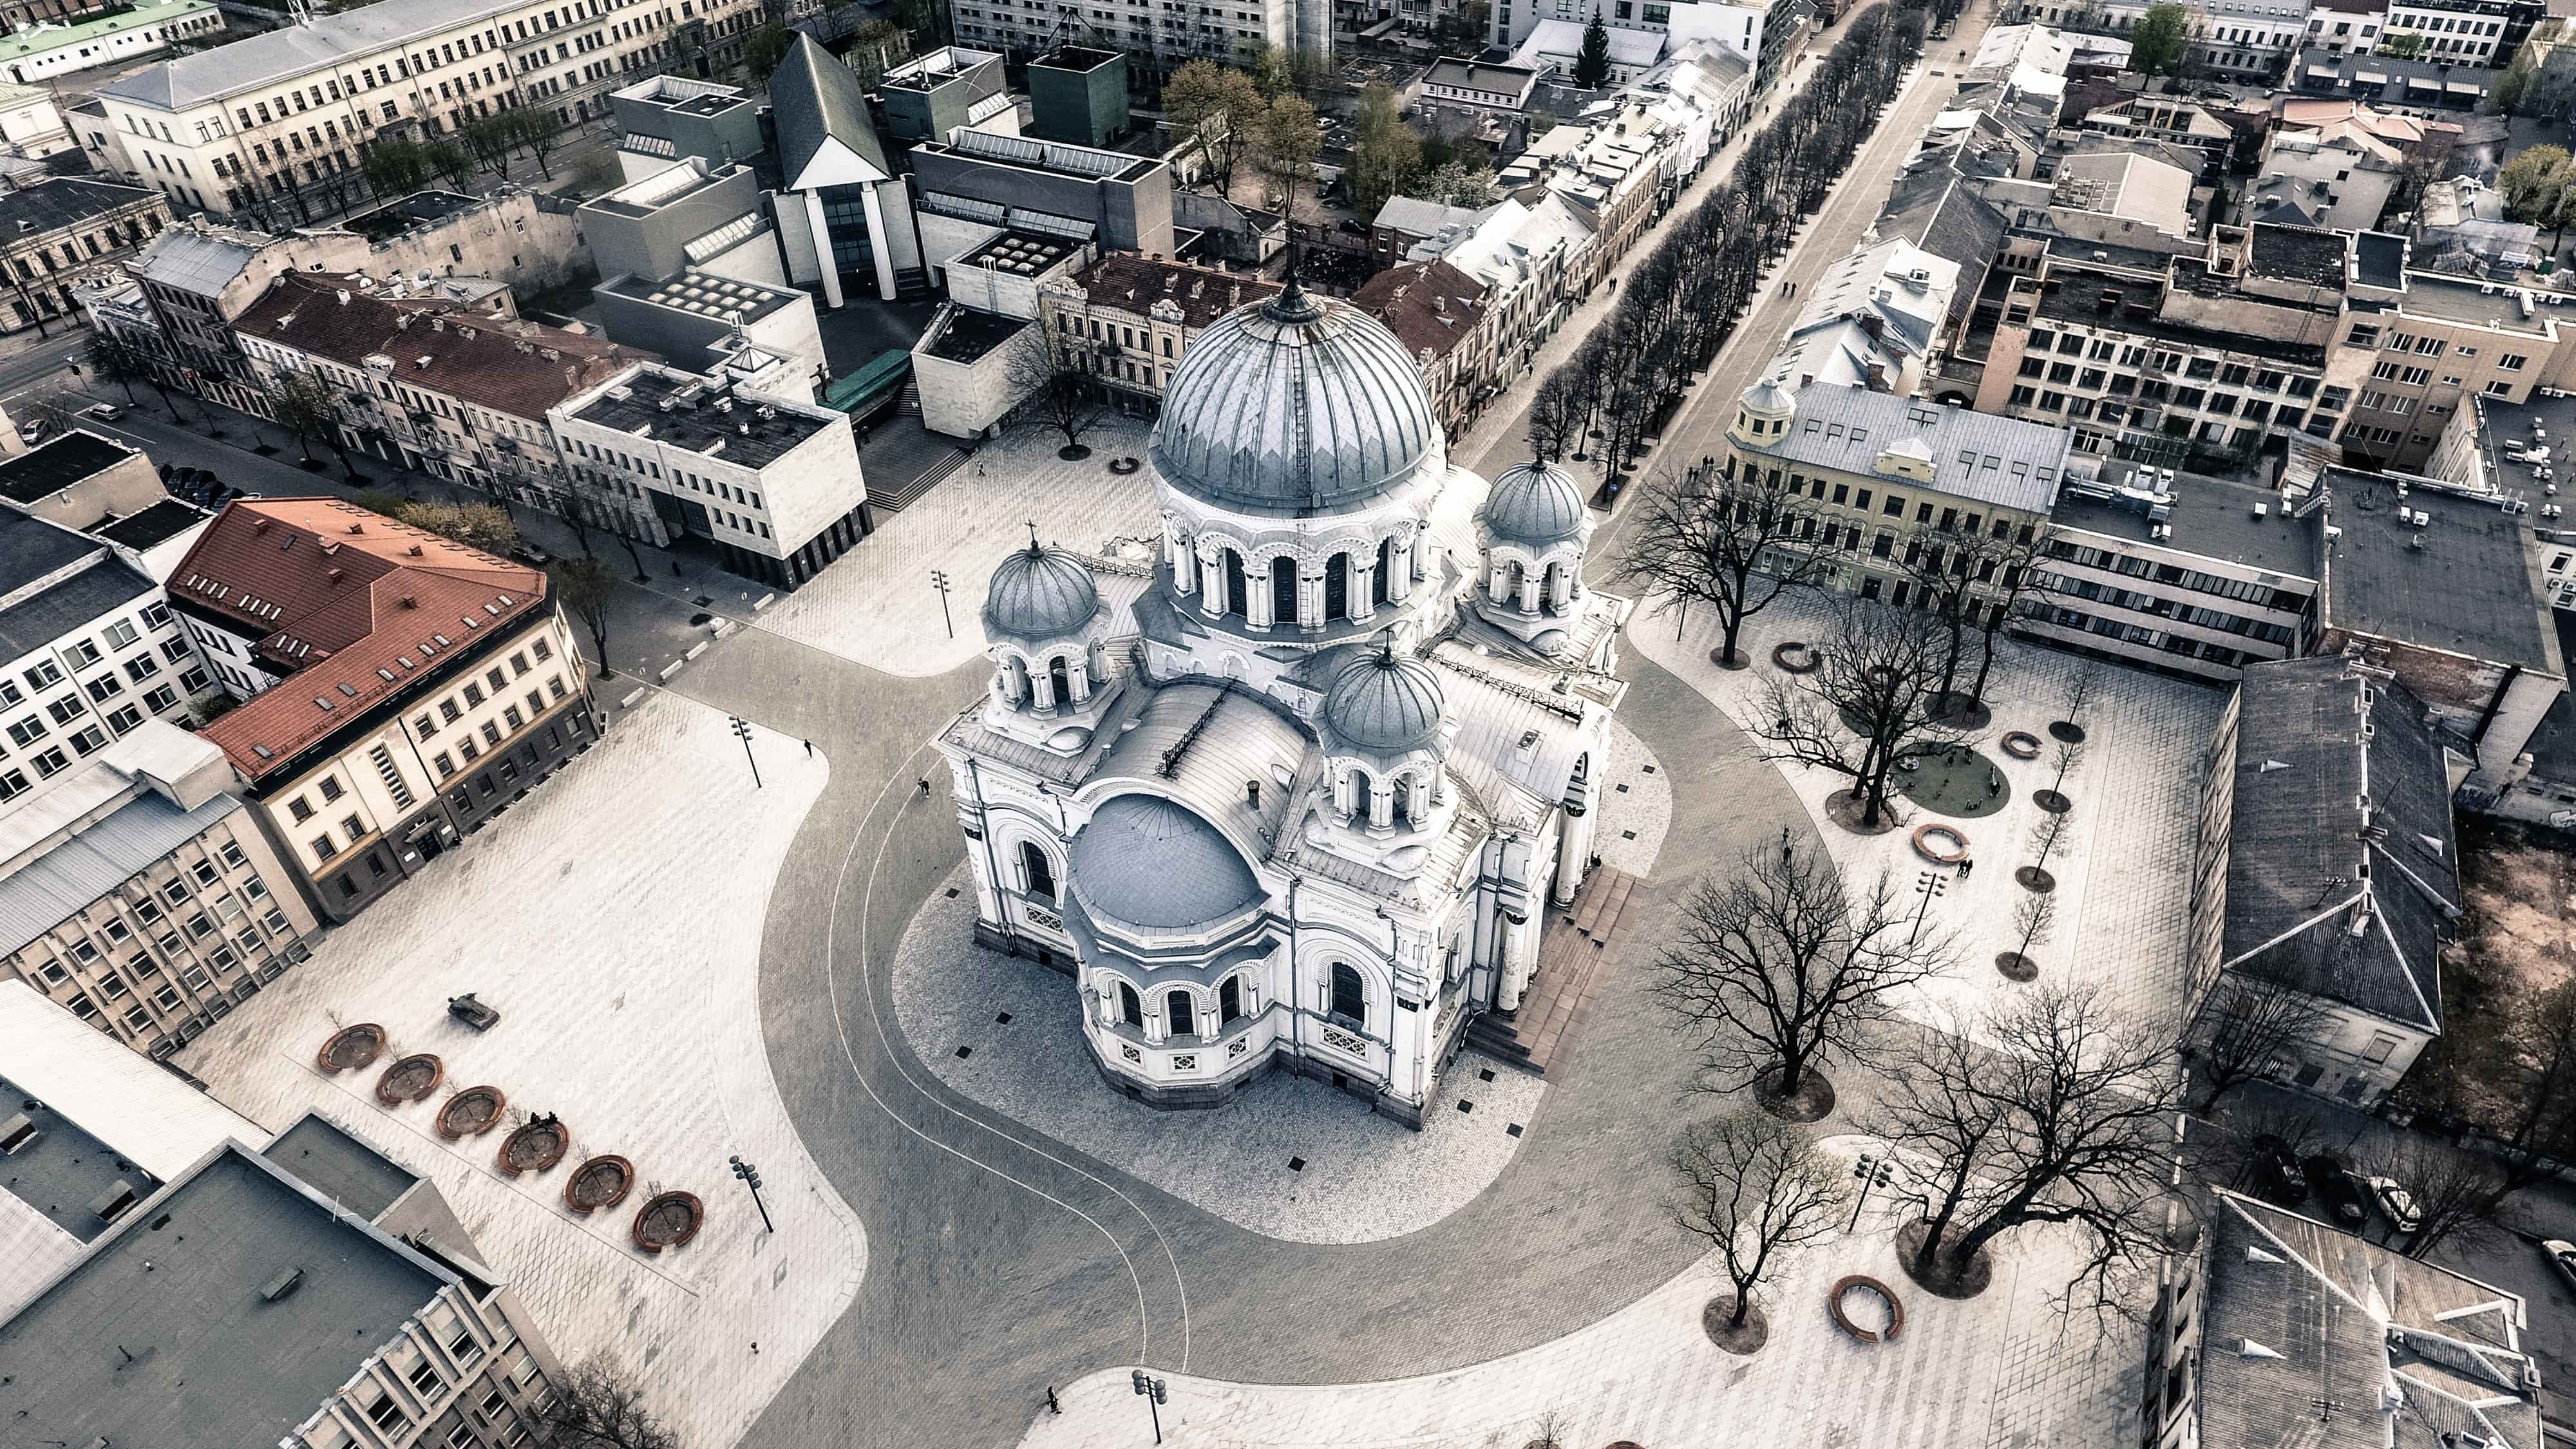 Bird's eye view picture of Kaunas